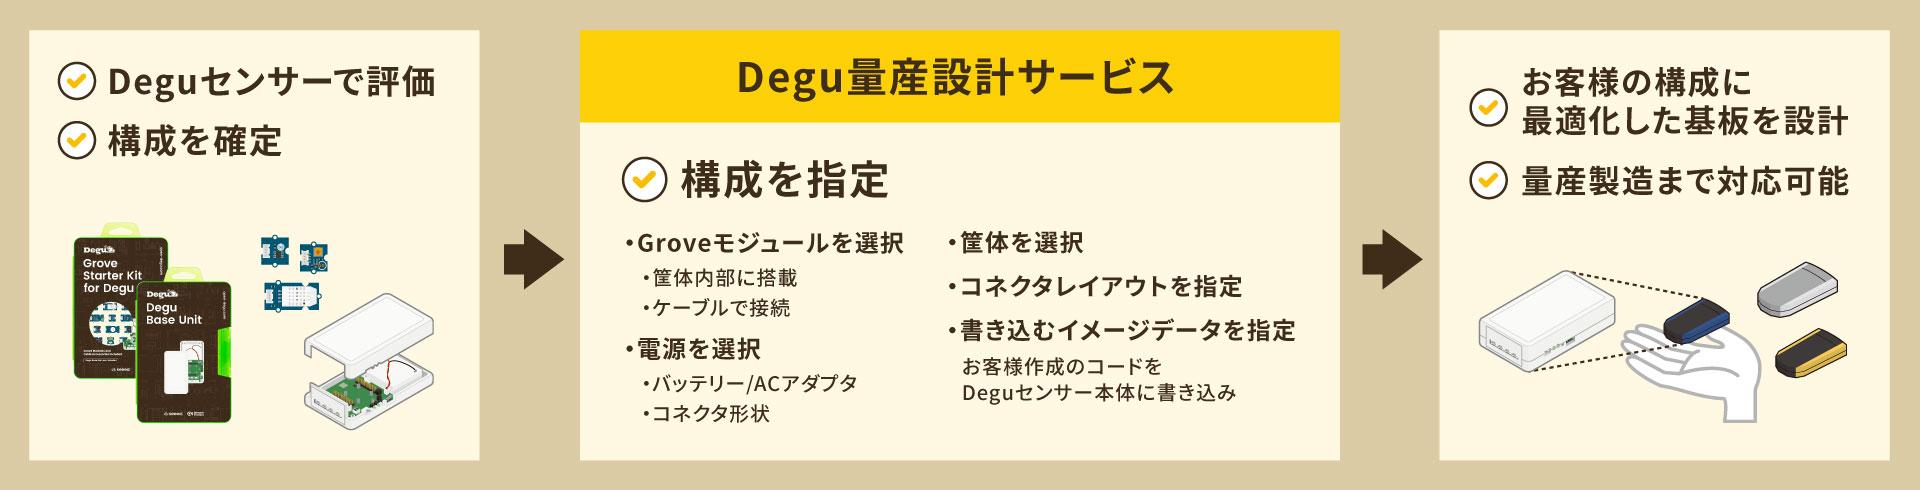 image_degu_01.jpg